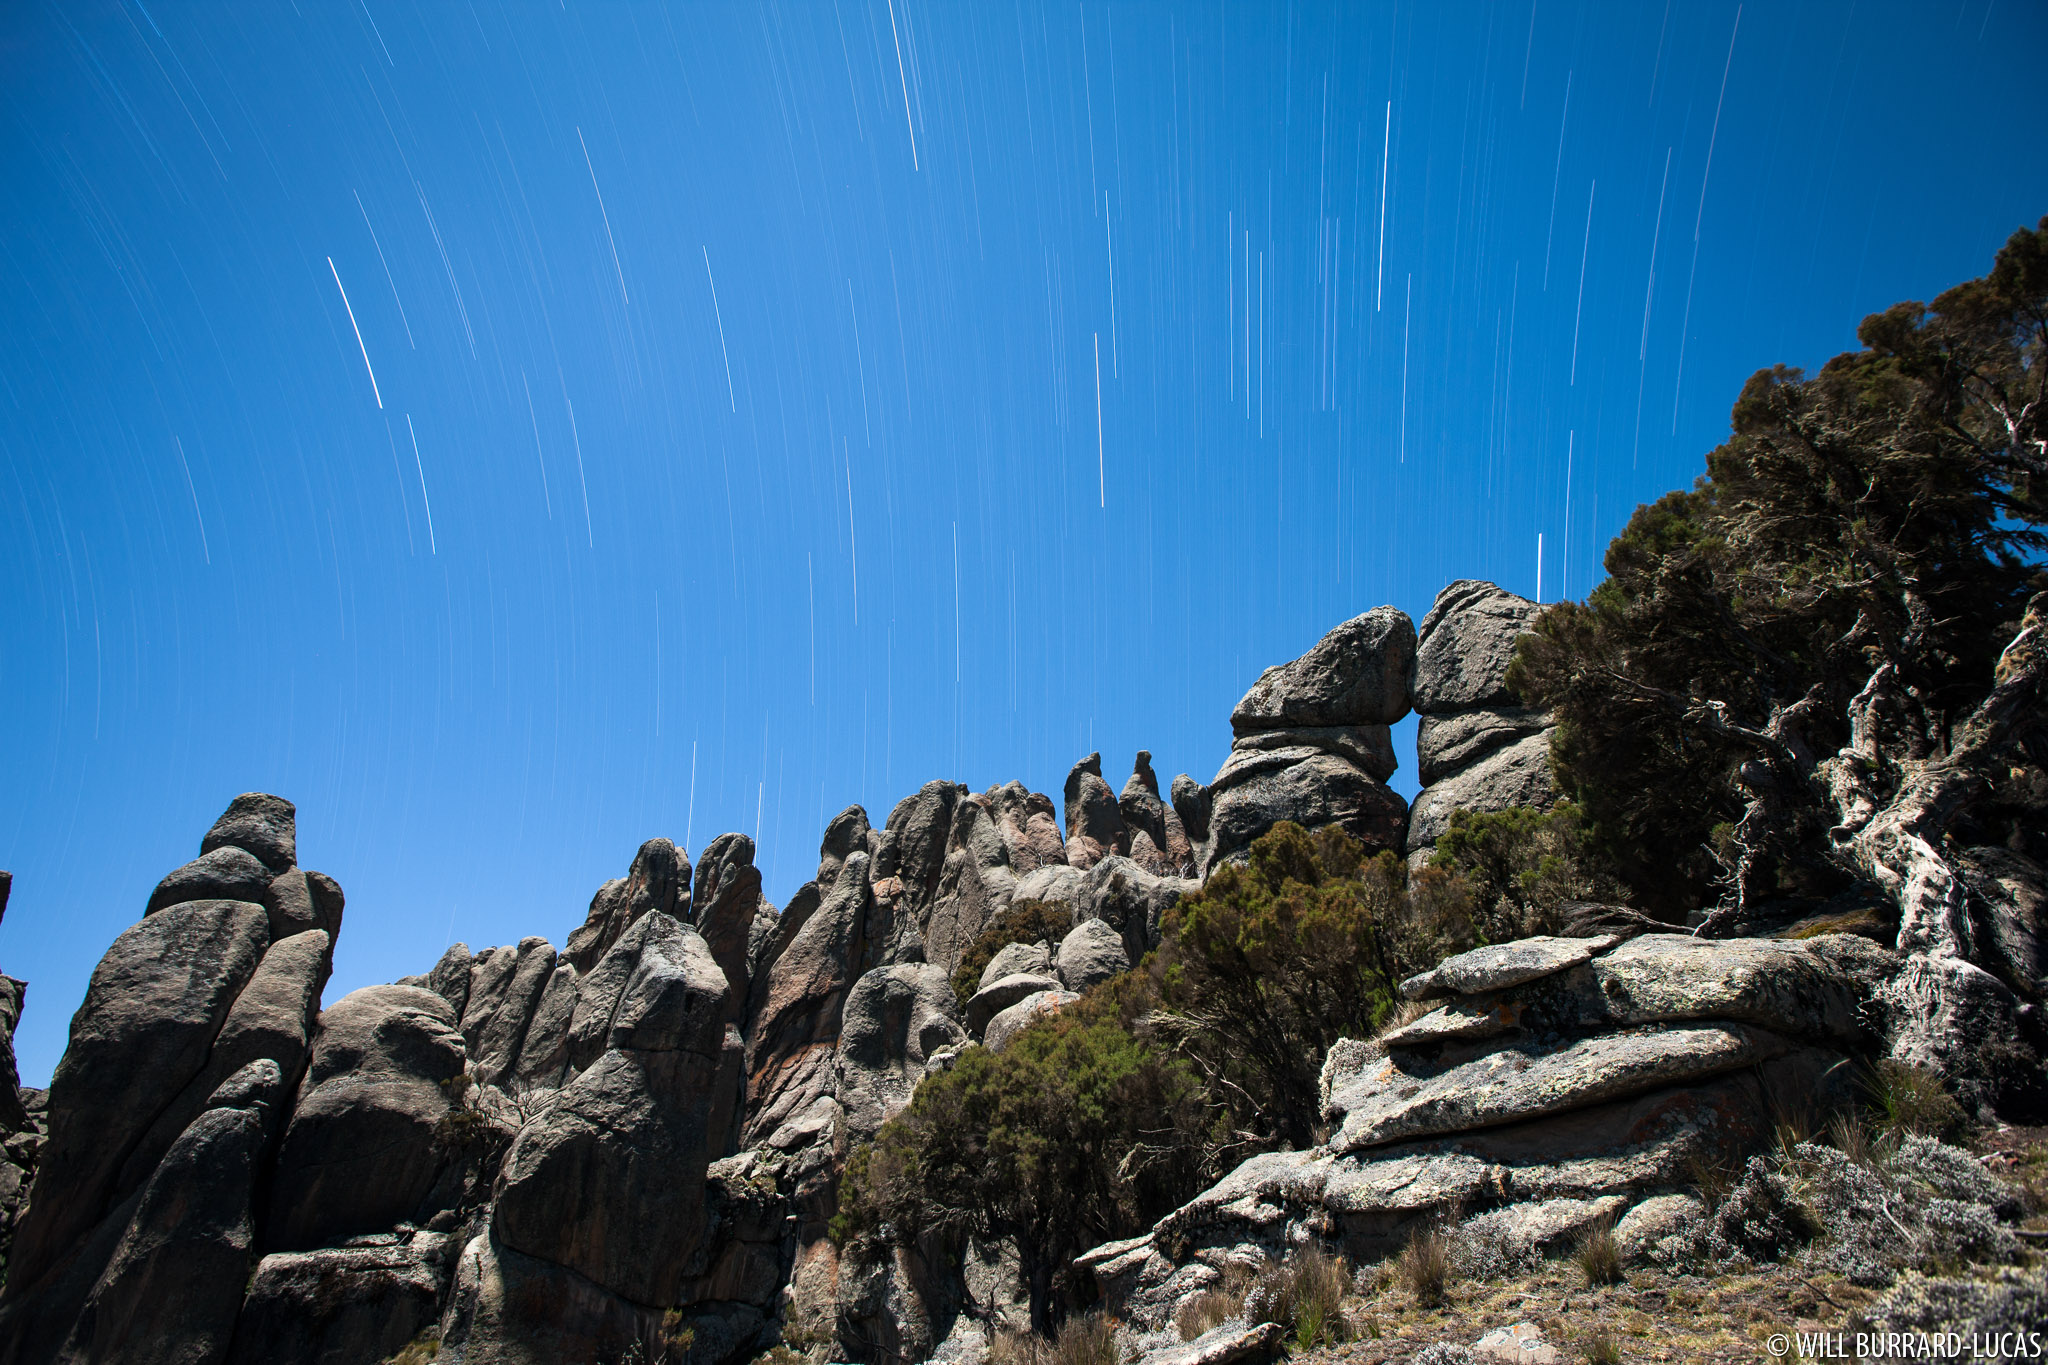 Starlit Landscape | Will Burrard-Lucas